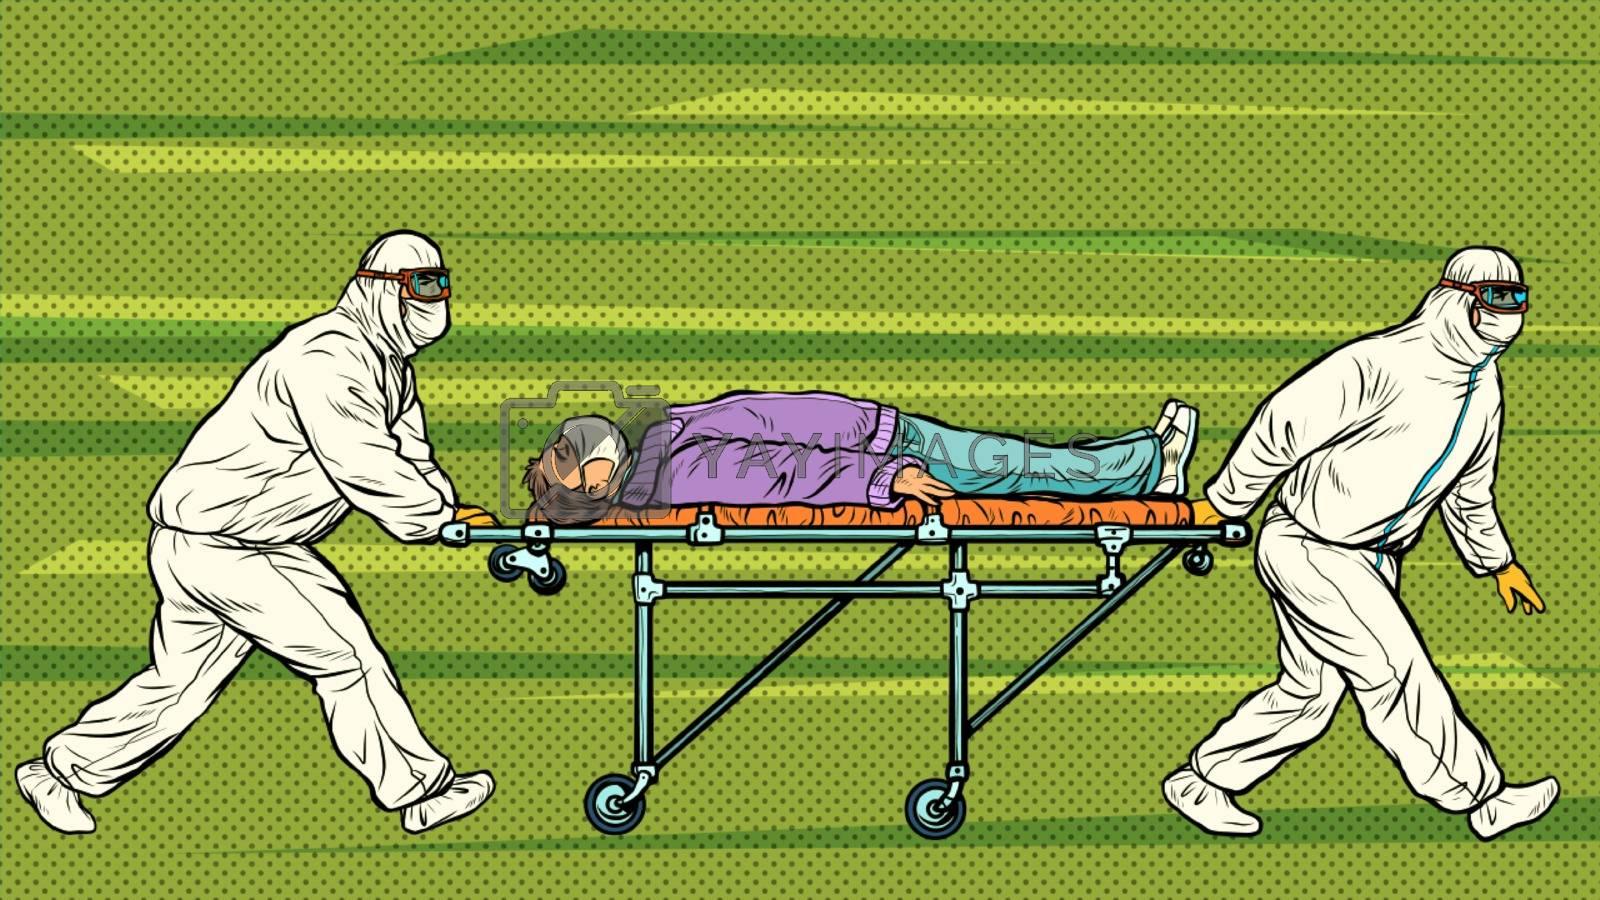 Doctors take away a sick patient. Novel Wuhan coronavirus 2019-nCoV epidemic outbreak. Pop art retro vector illustration 50s 60s style